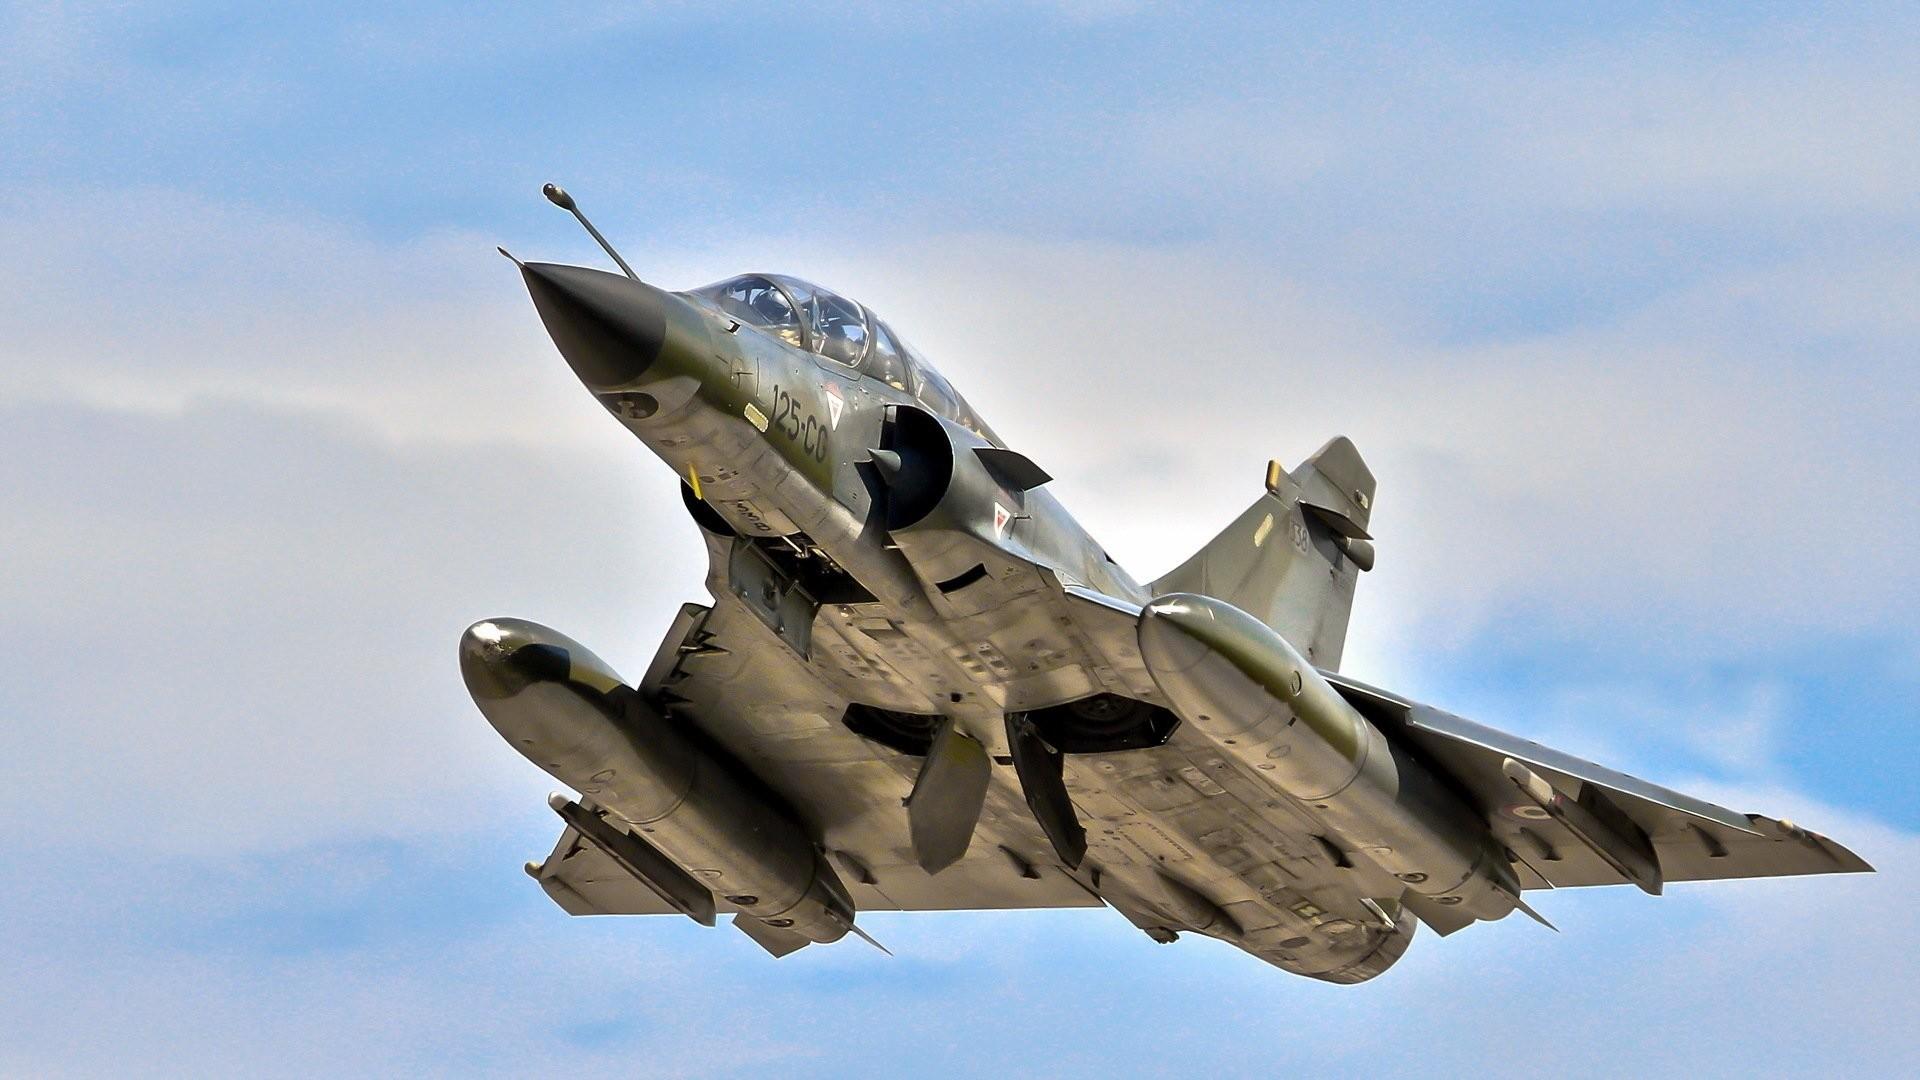 Aircraft Dassault Mirage 2000 Jet Fighter Warplane - Mirage 2000 Full Hd , HD Wallpaper & Backgrounds